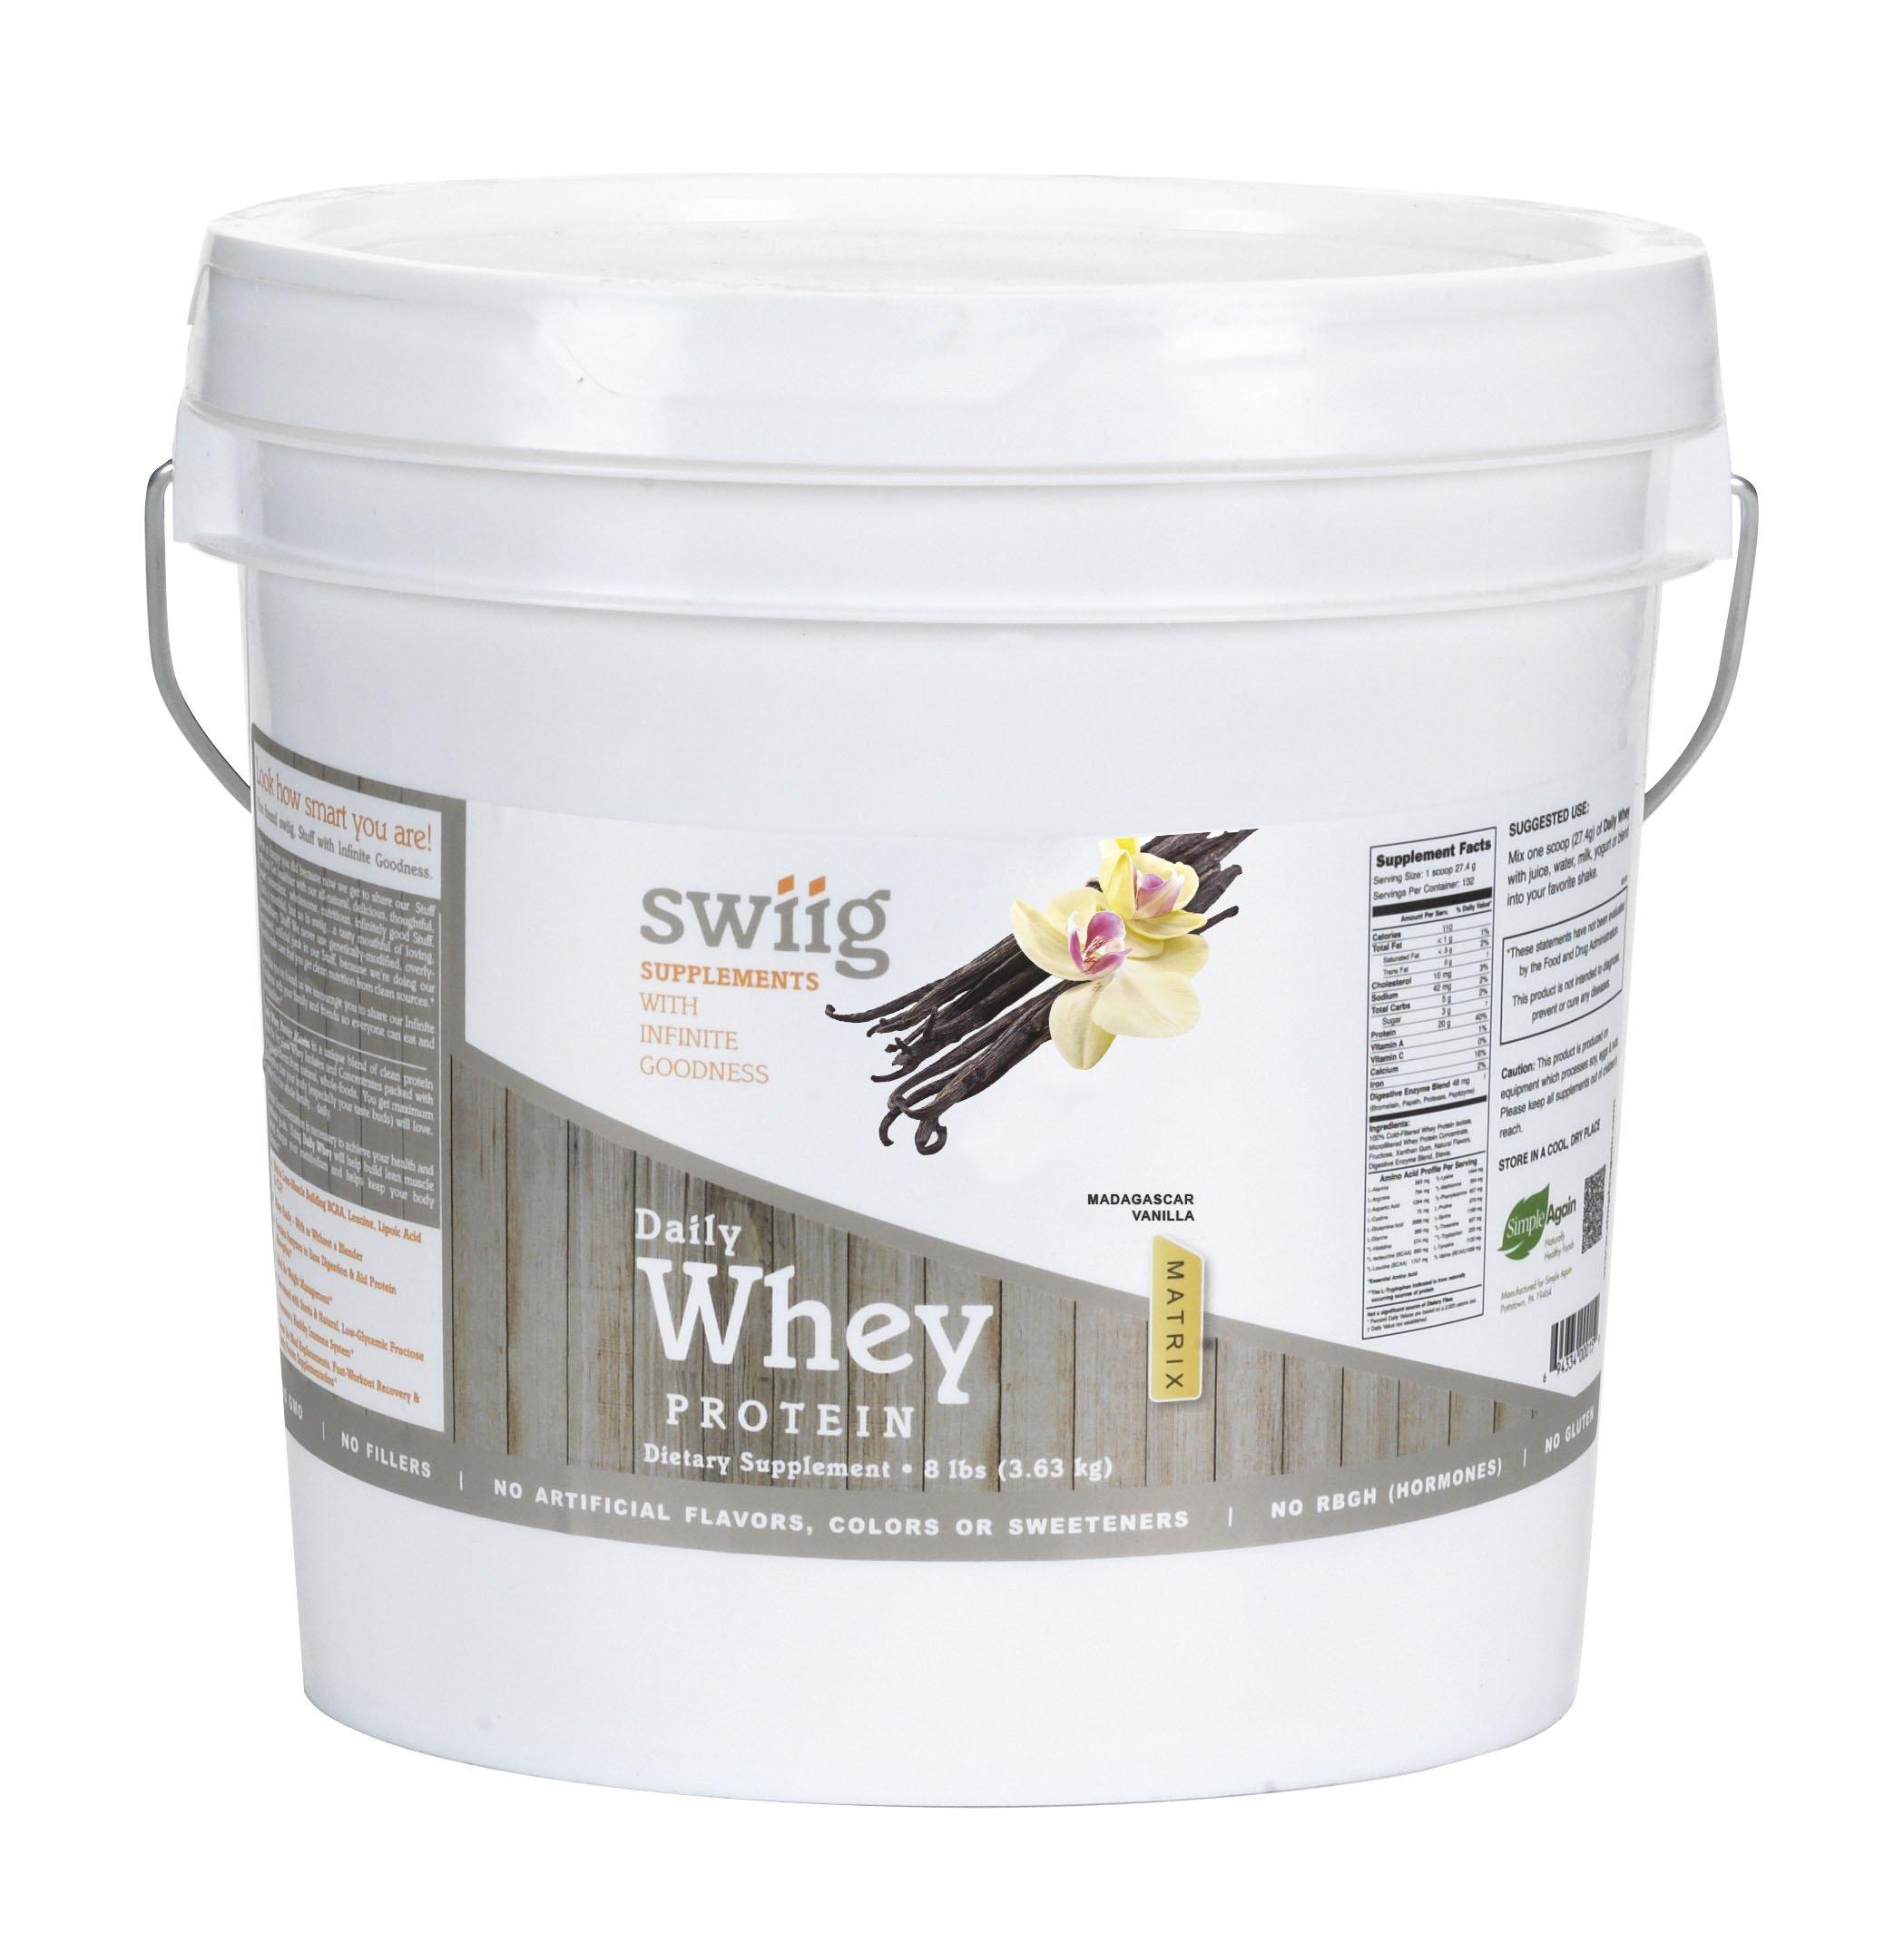 swiig Daily Whey Matrix Vanilla - 8lb